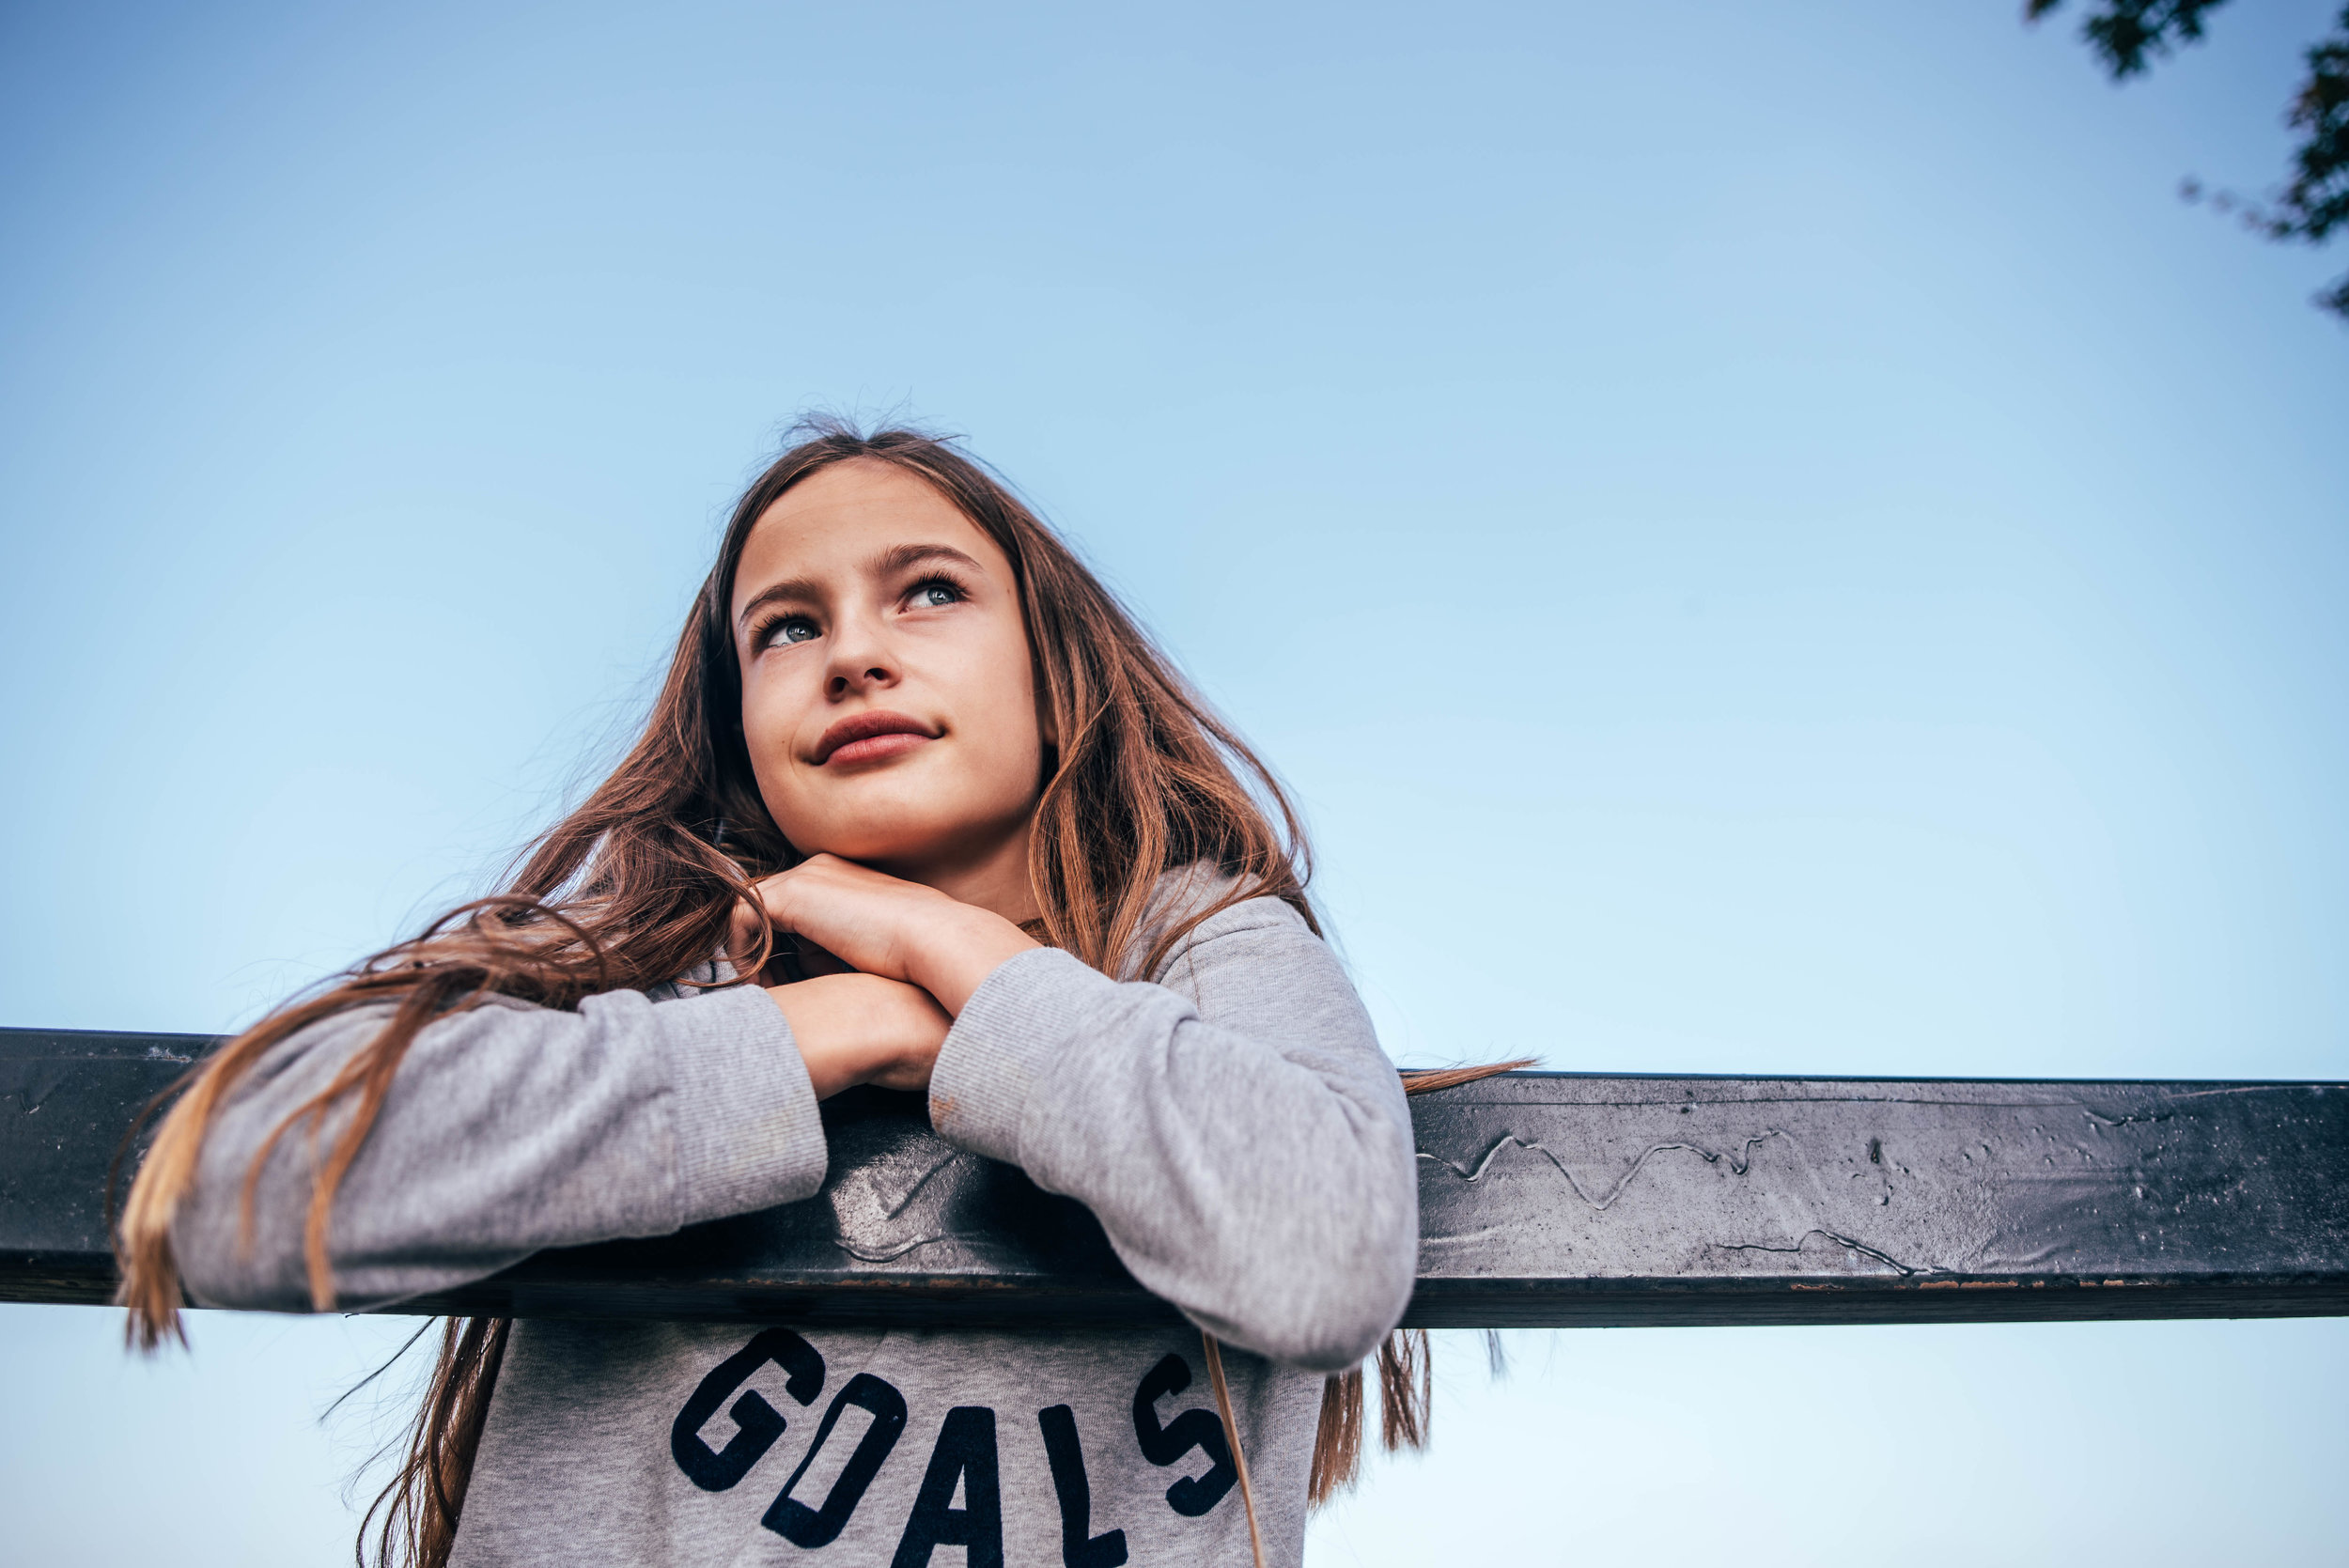 Tween girl leans on fence Essex UK Documentary Wedding Photographer